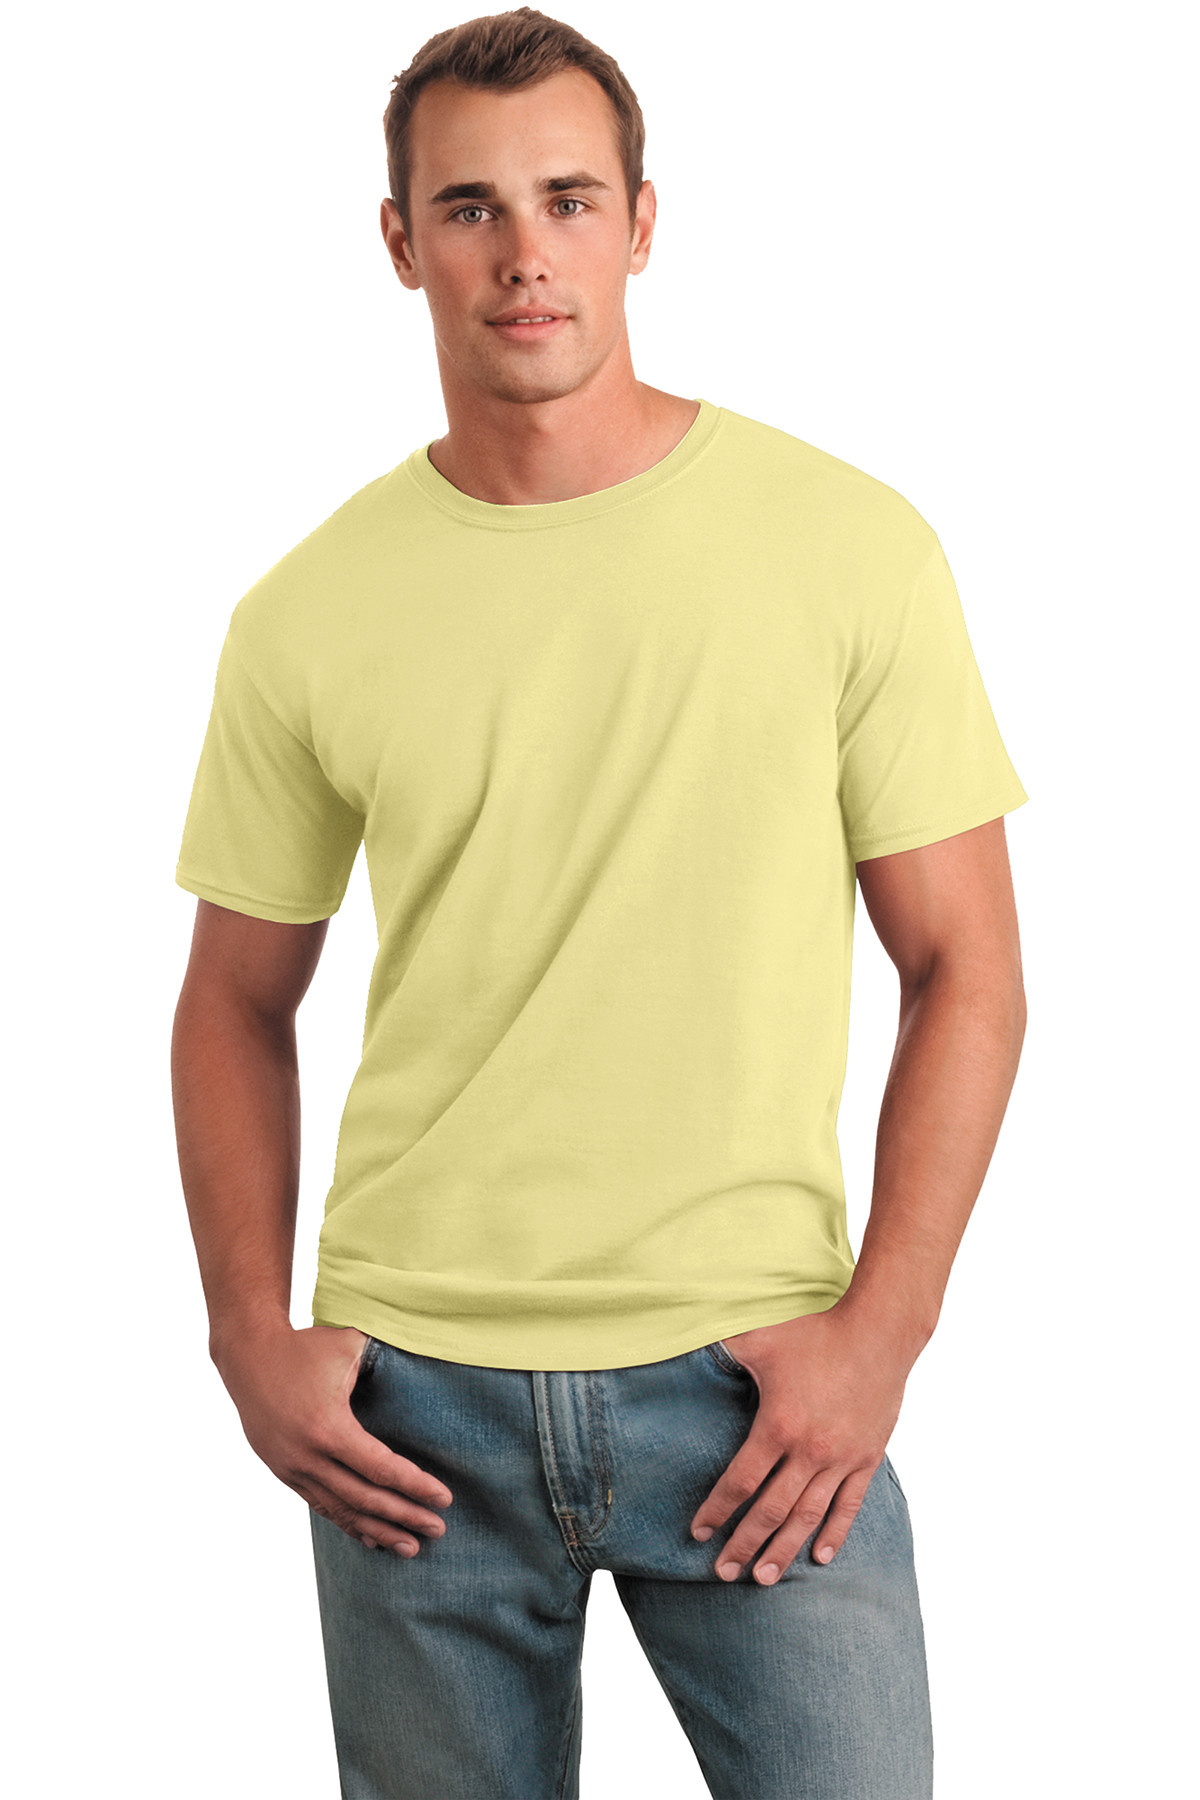 fa59f73c4dd Gildan Softstyle® T-Shirt